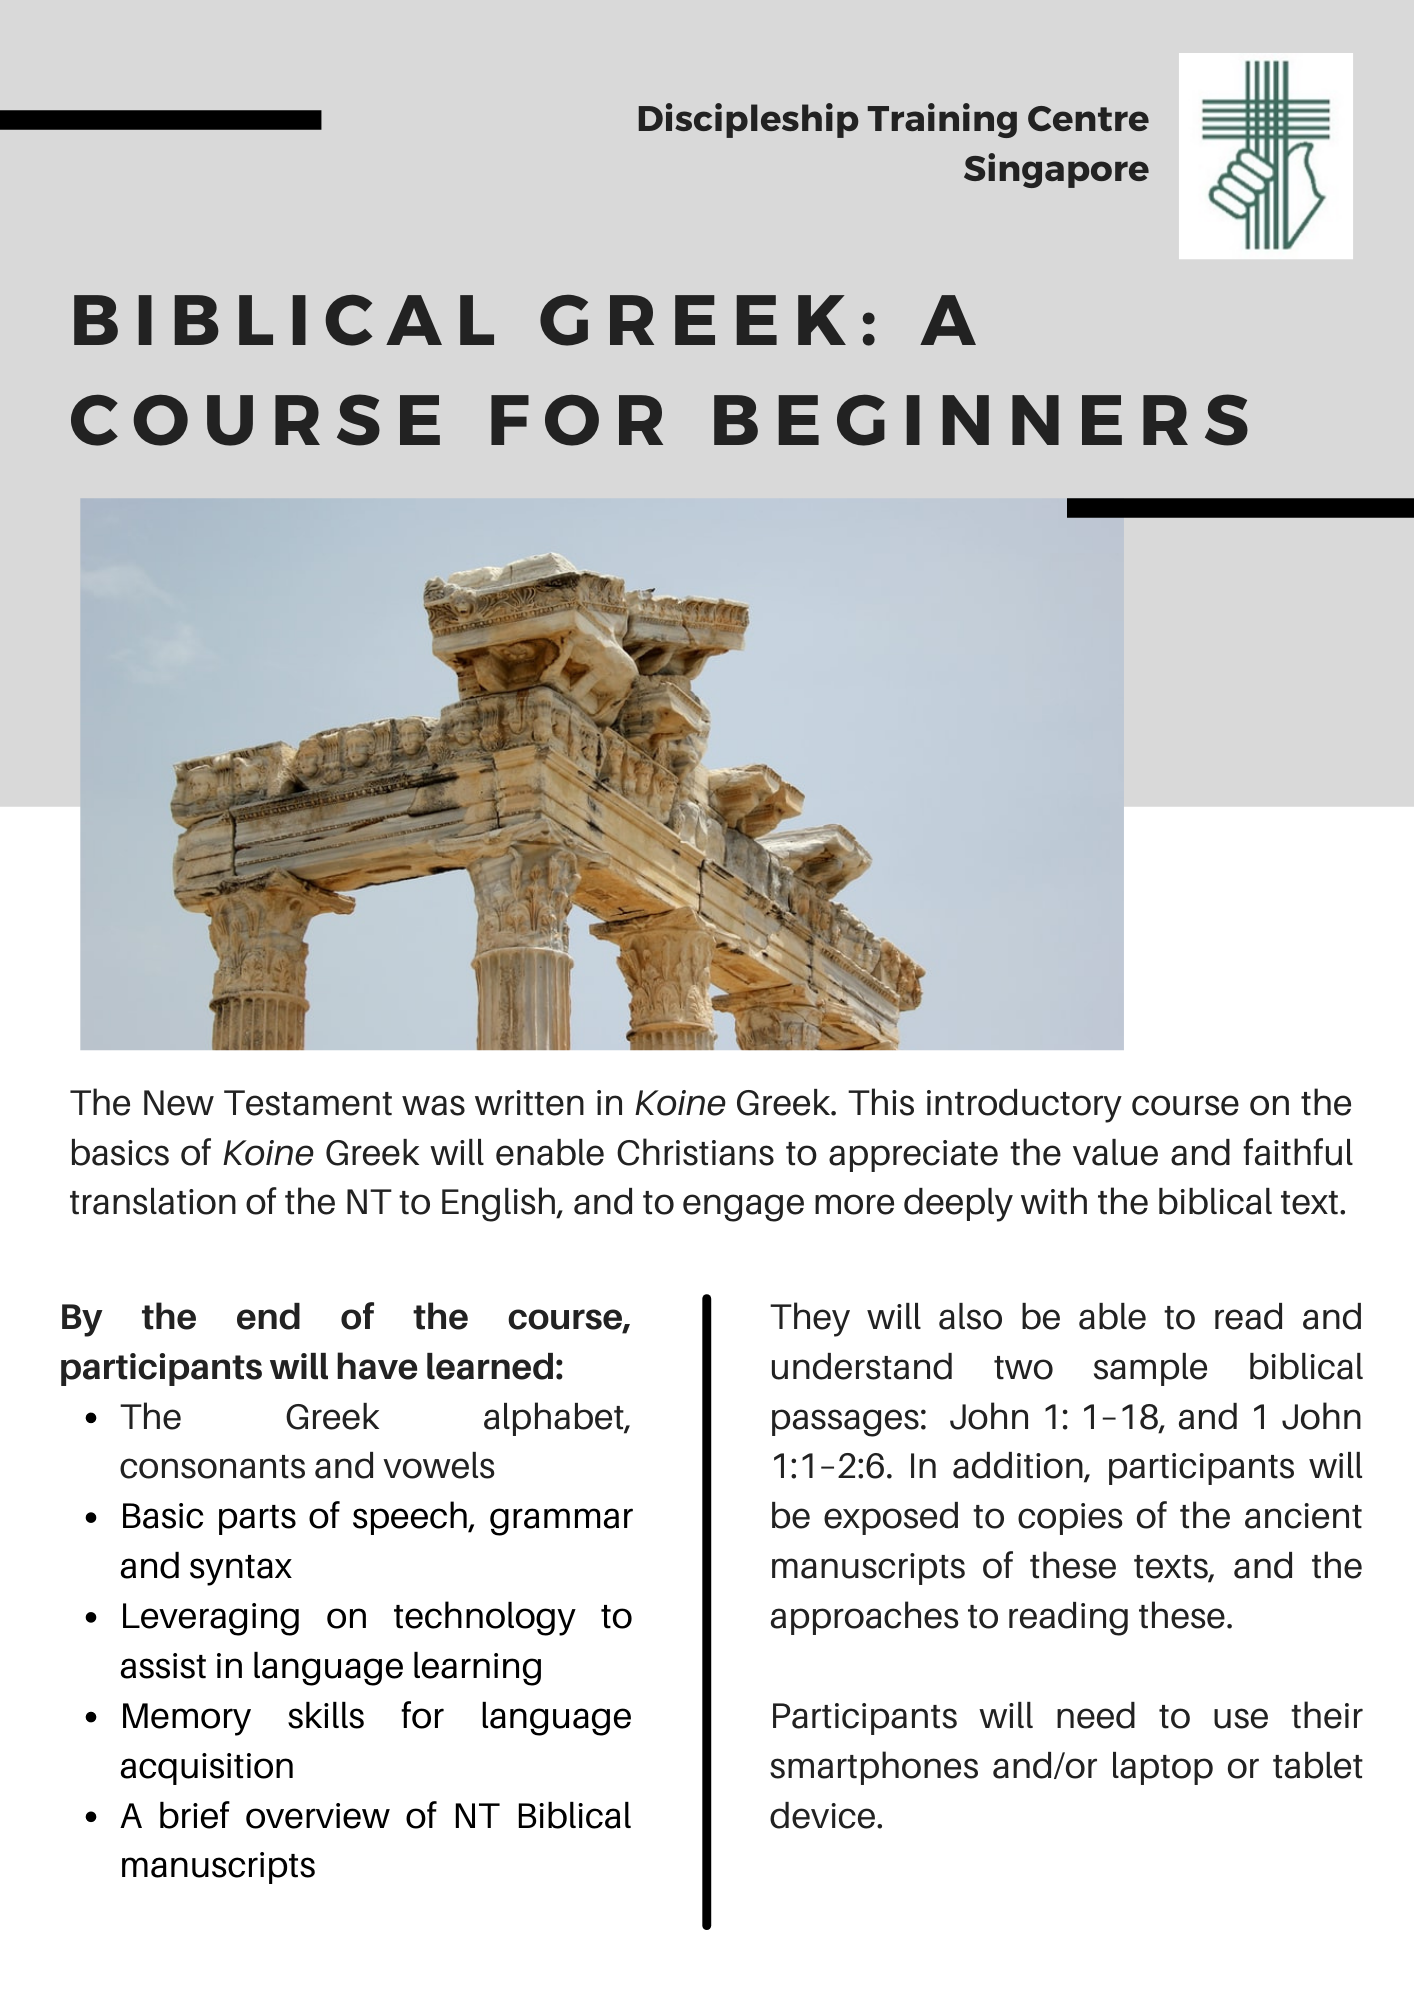 Biblical Greek: A course for beginners